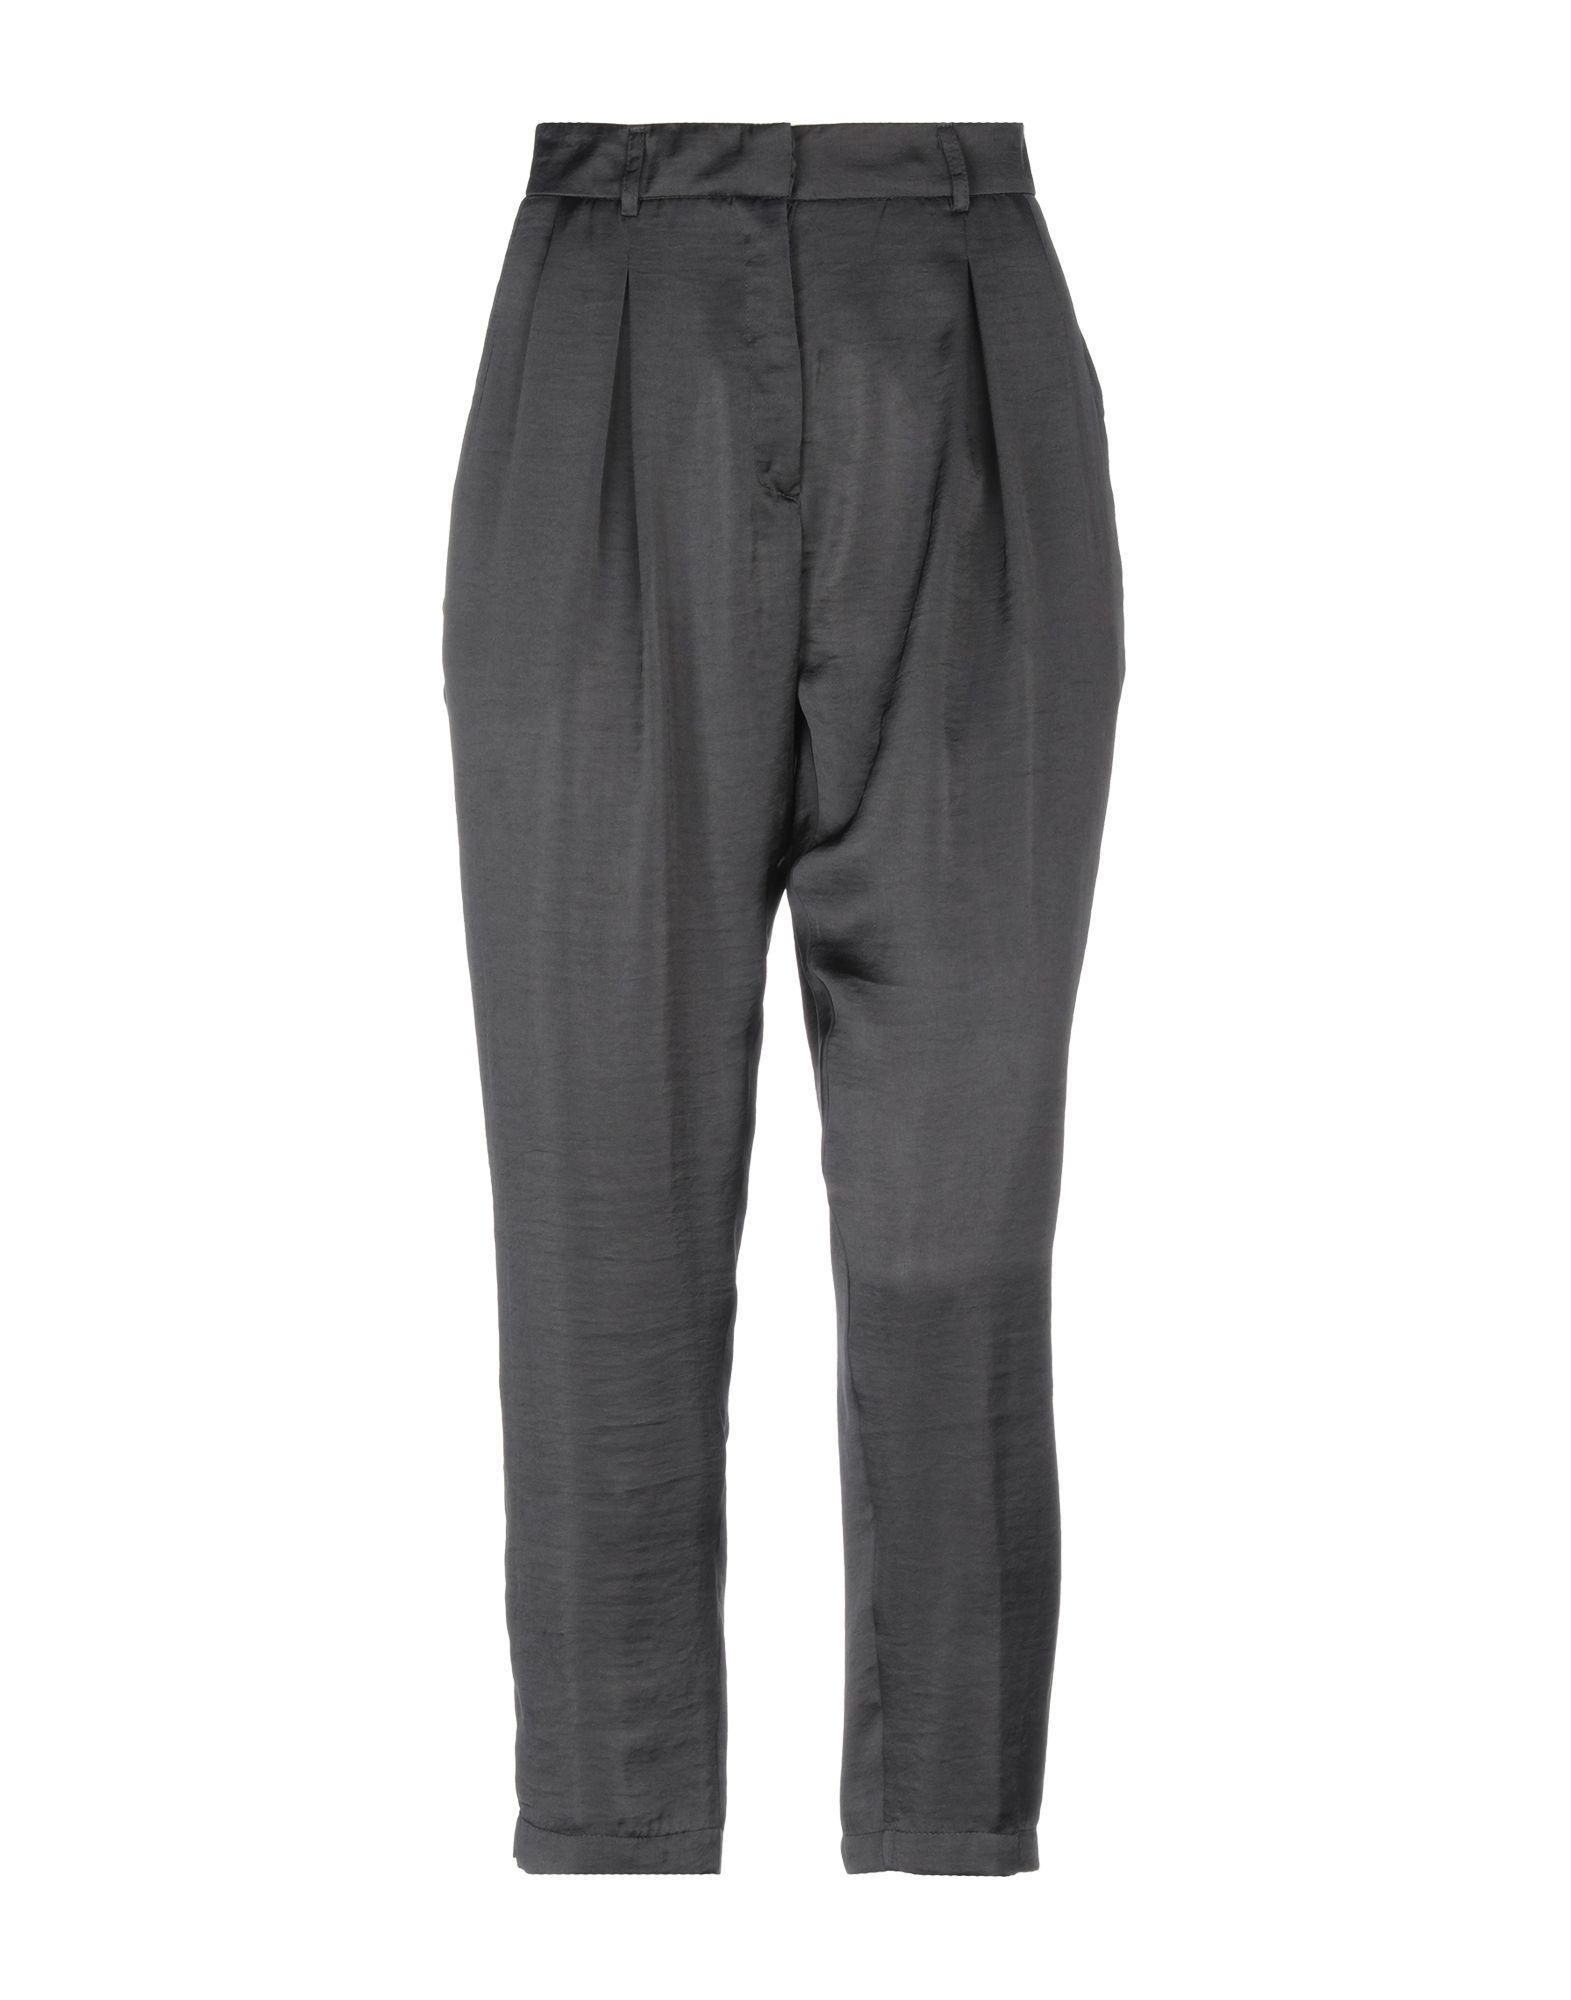 lucille блузка LUCILLE Повседневные брюки